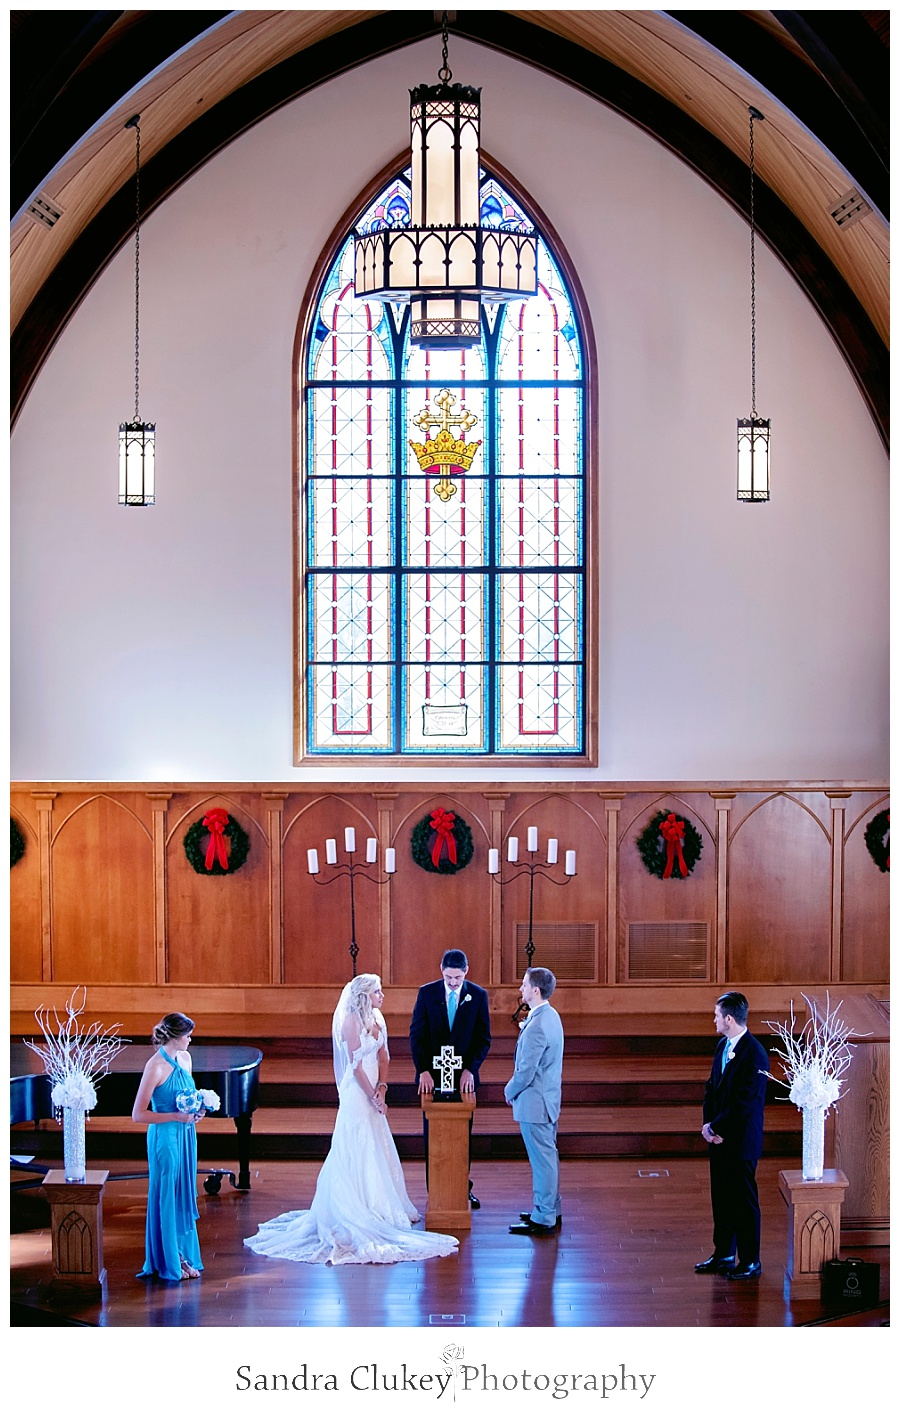 Cleveland, TN wedding at Lee University Chapel